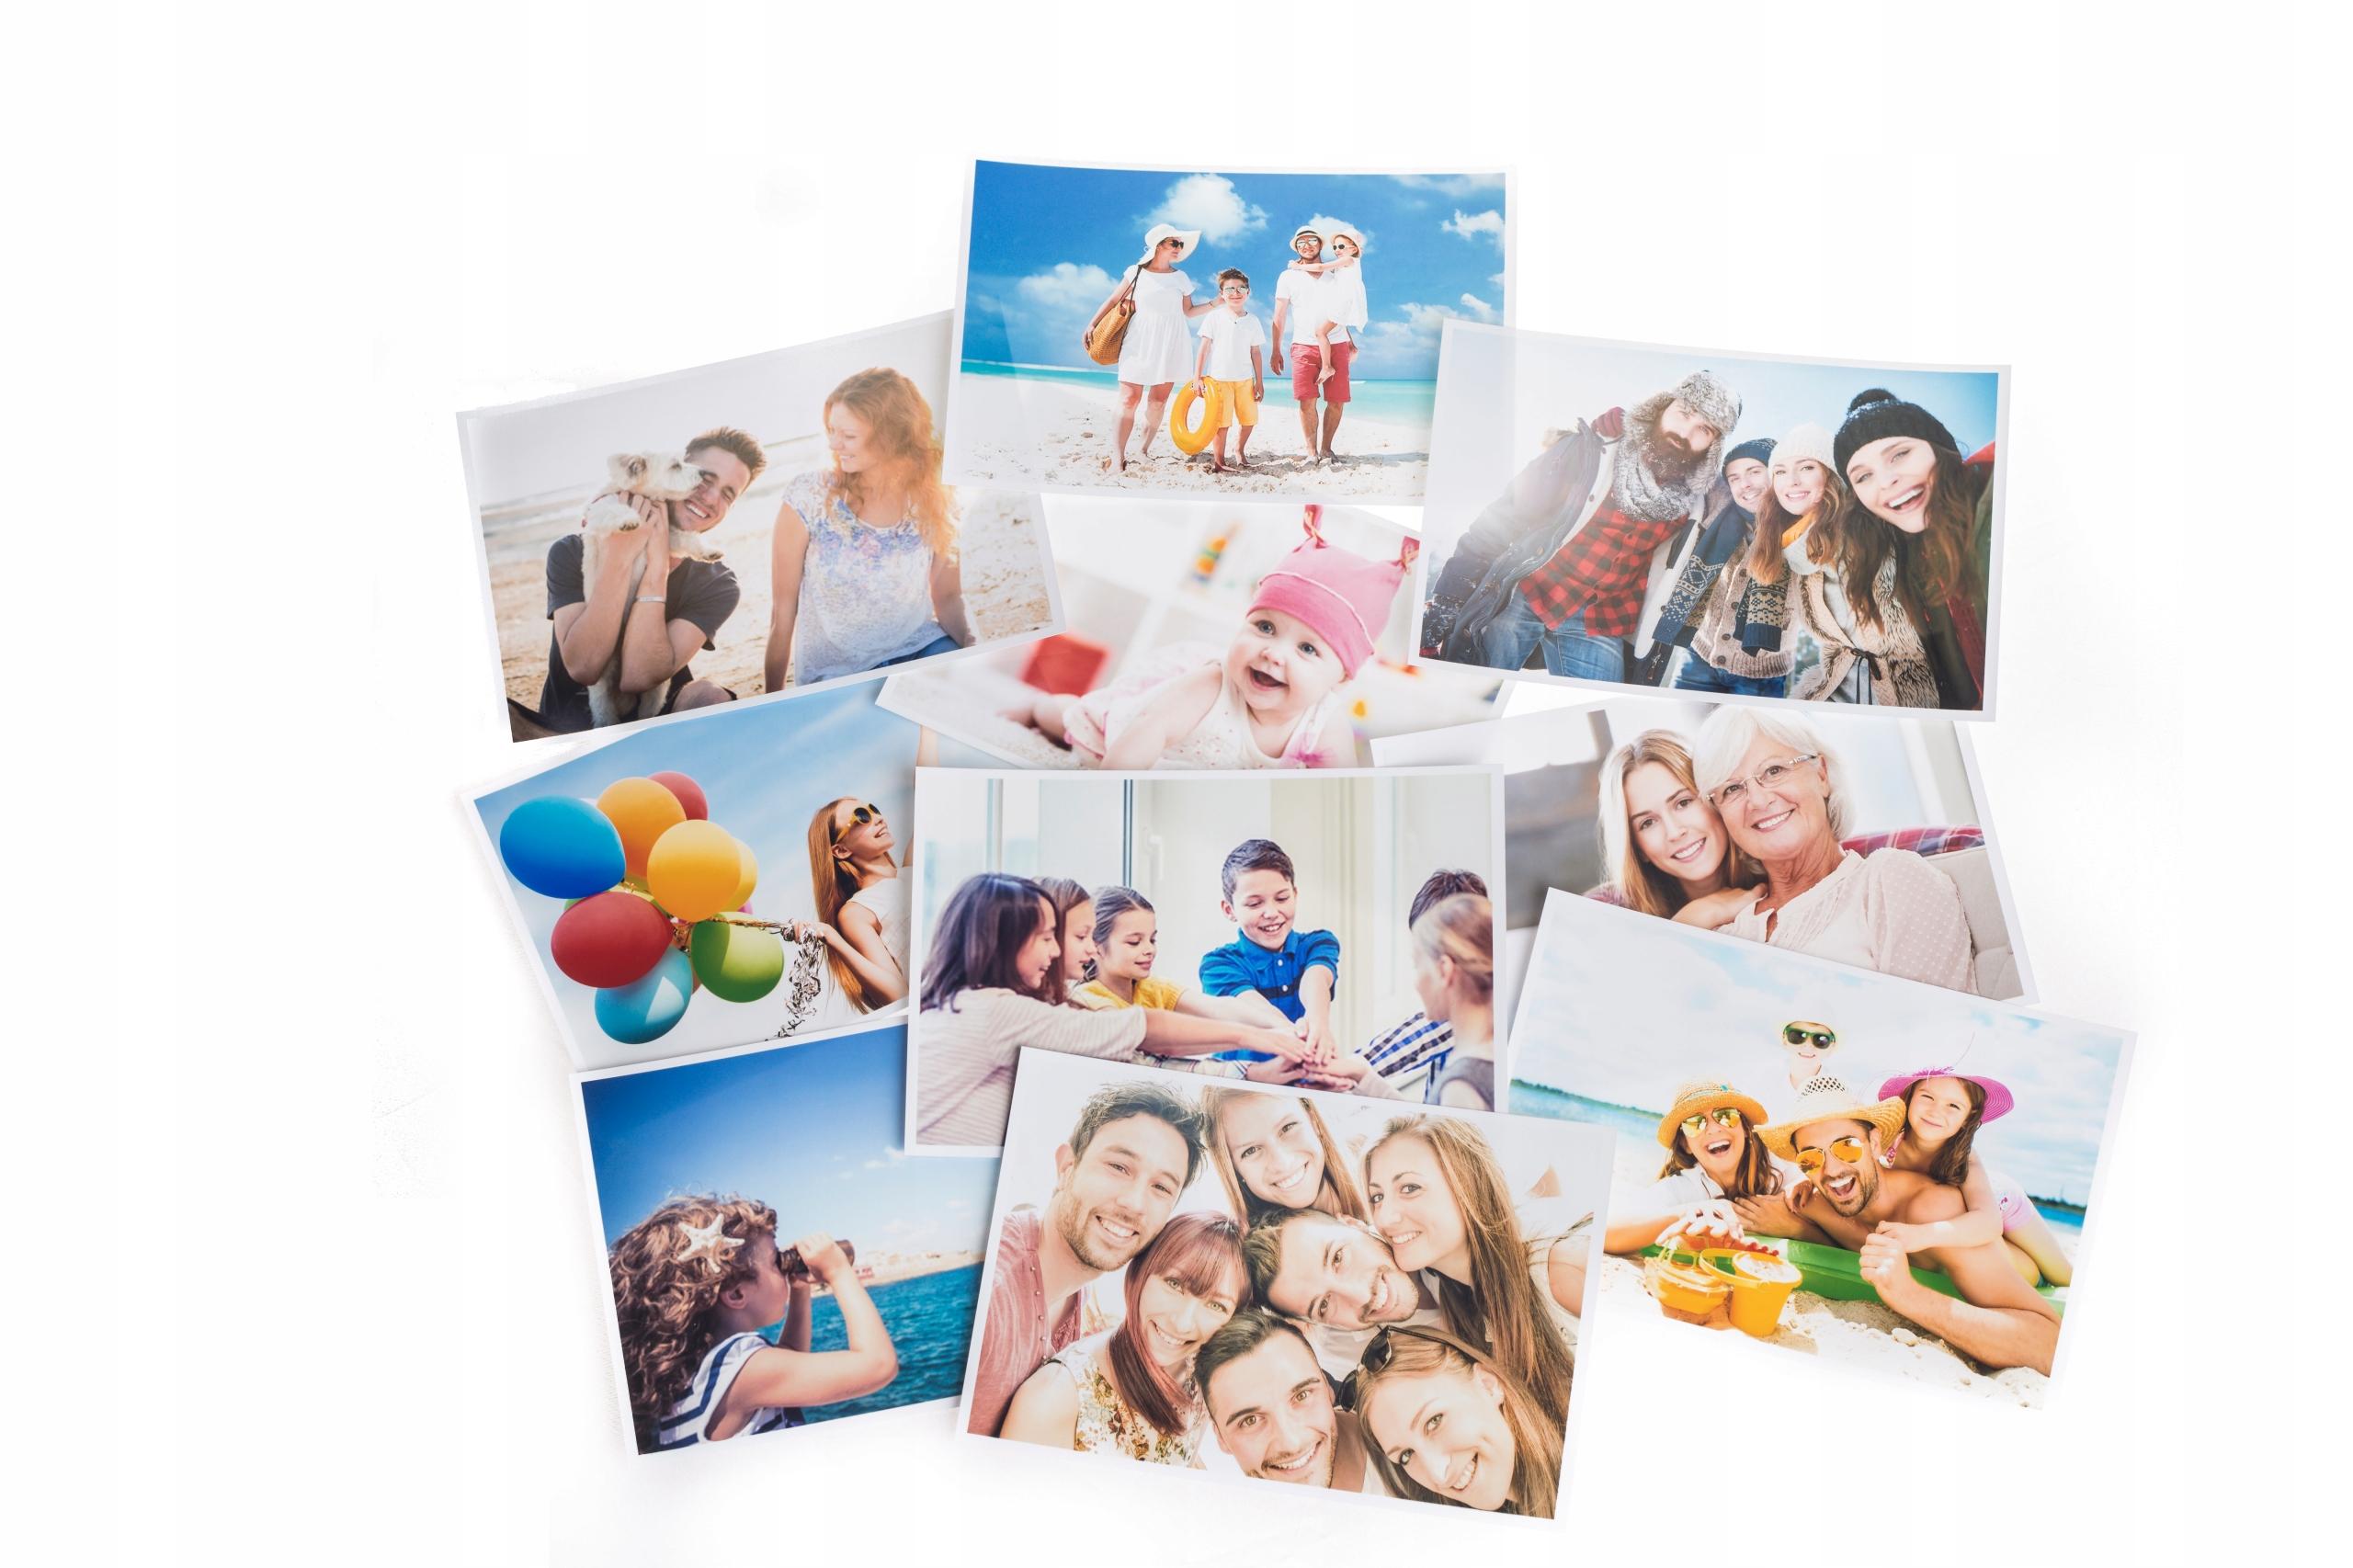 Item Call 50 photos 10x15 prints call 24 HOURS